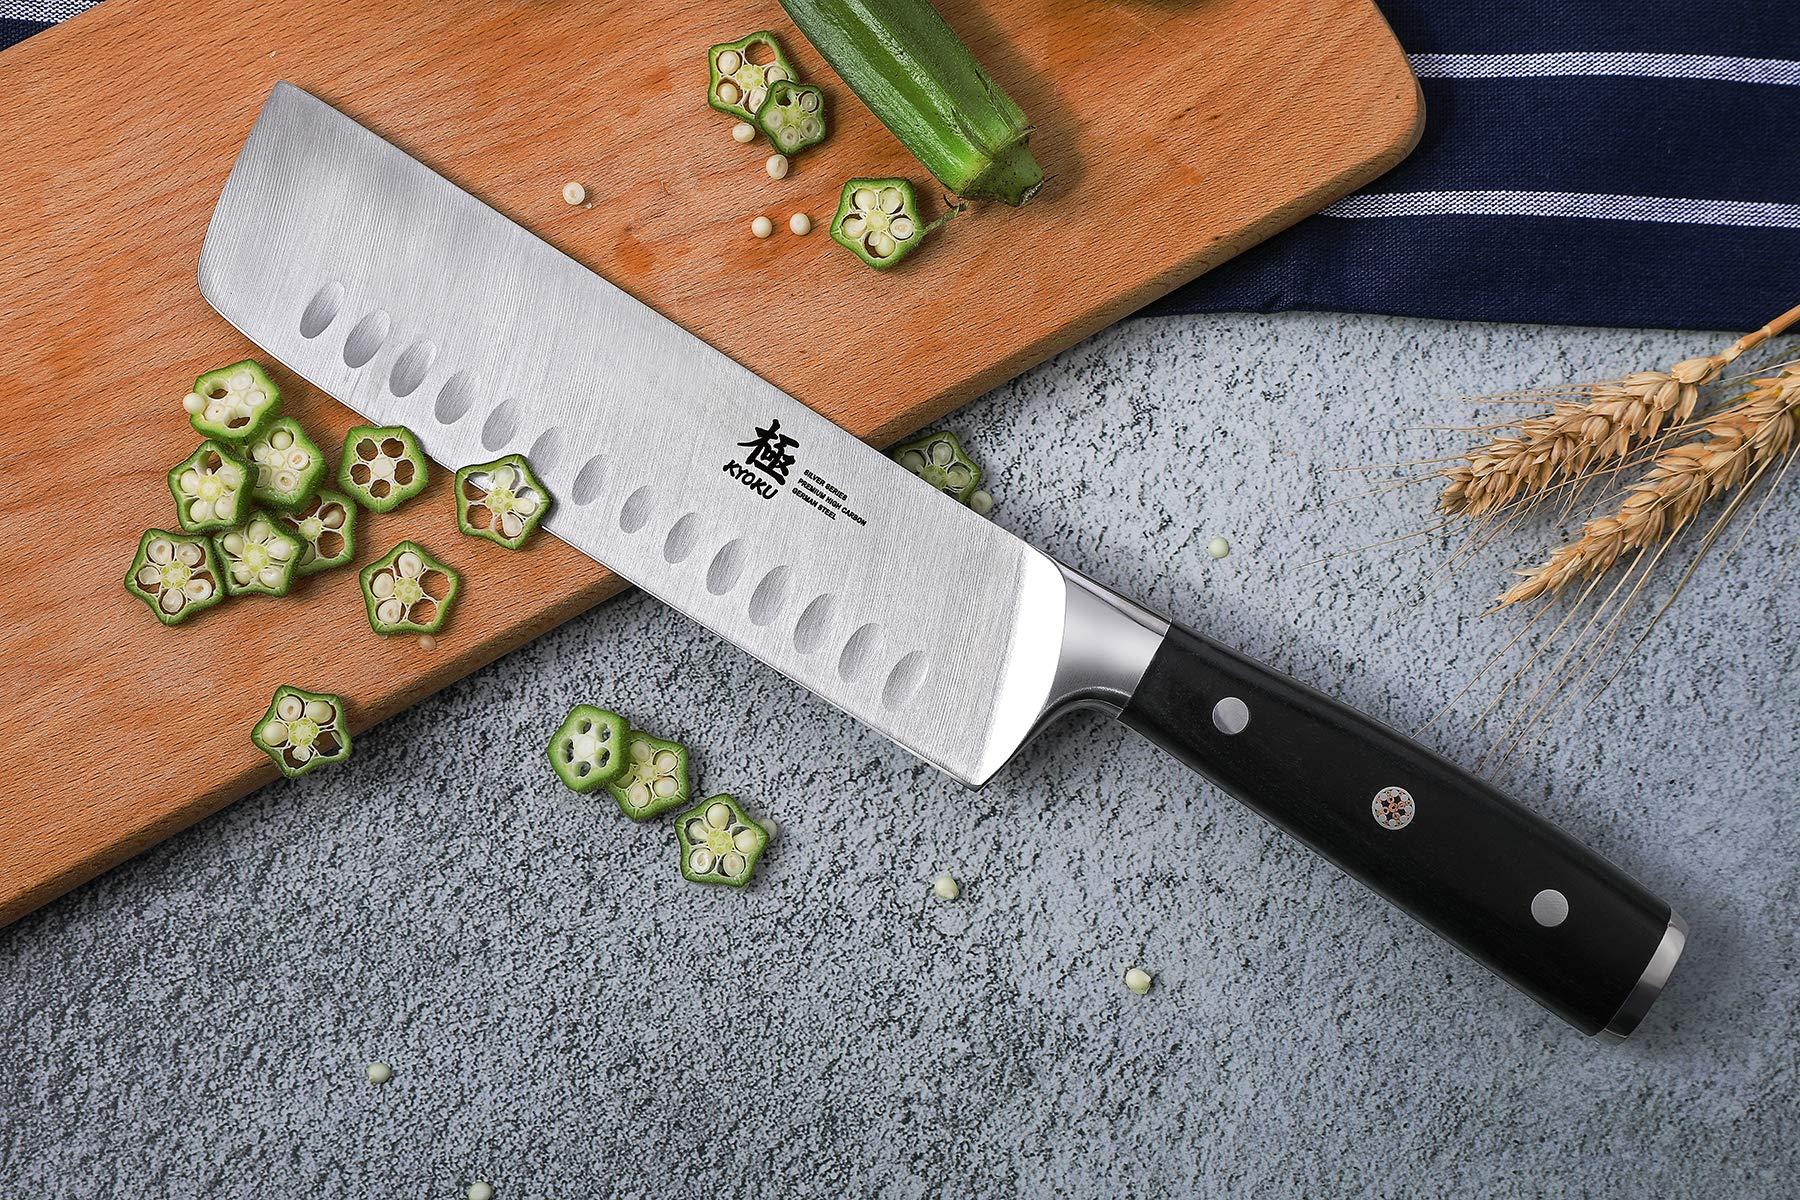 KYOKU Samurai Series - Nakiri Japanese Vegetable Knife 7'' with Sheath & Case - Full Tang - Japanese High Carbon Steel - Pakkawood Handle with Mosaic Pin by KYOKU (Image #3)